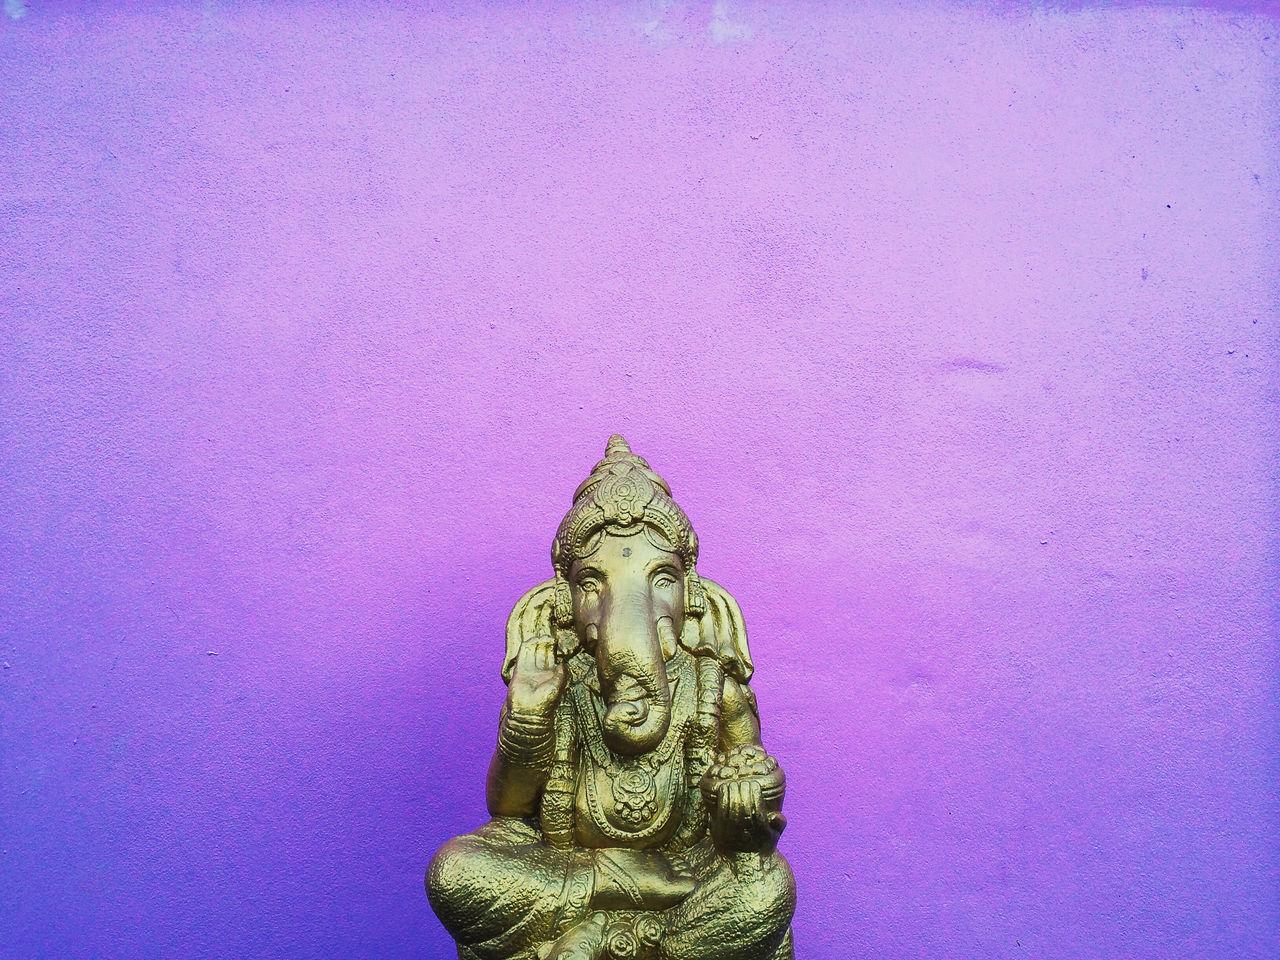 Ganesha Statue Against Purple Against Wall